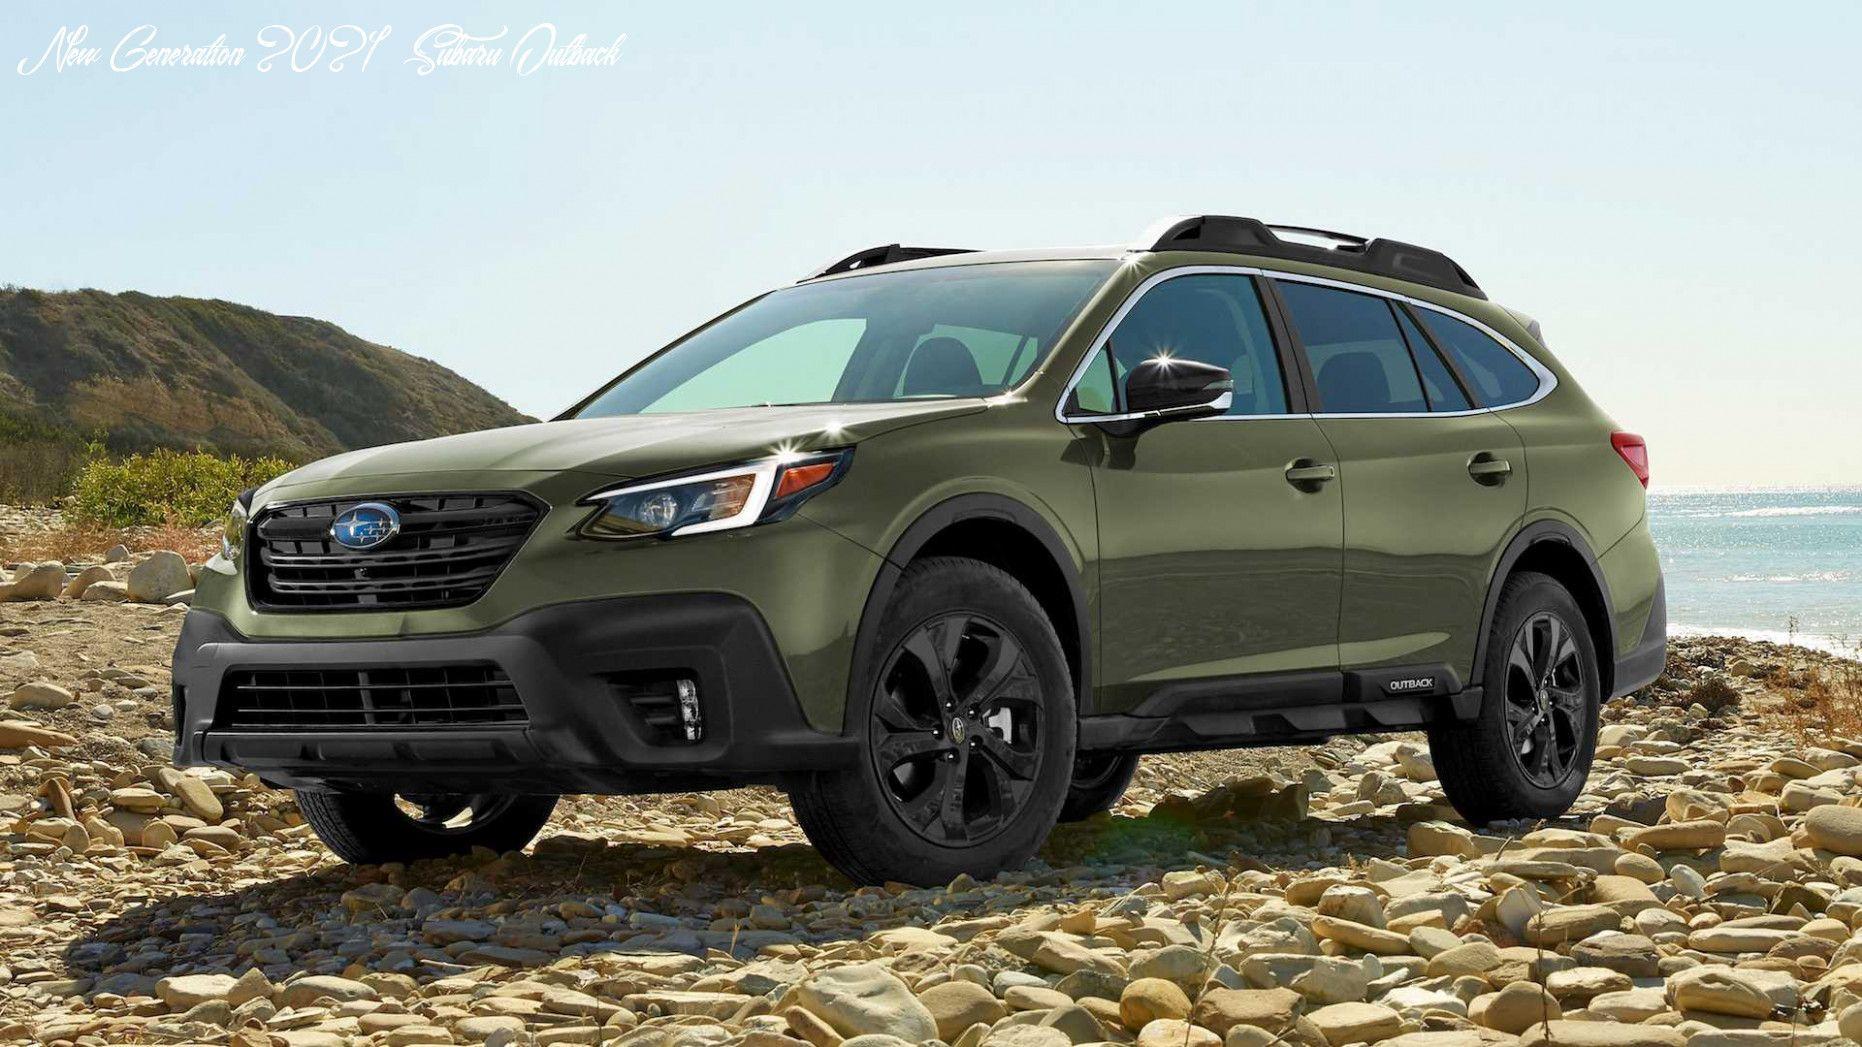 New Generation 2021 Subaru Outback Review In 2020 Subaru Outback Subaru Subaru Wrx